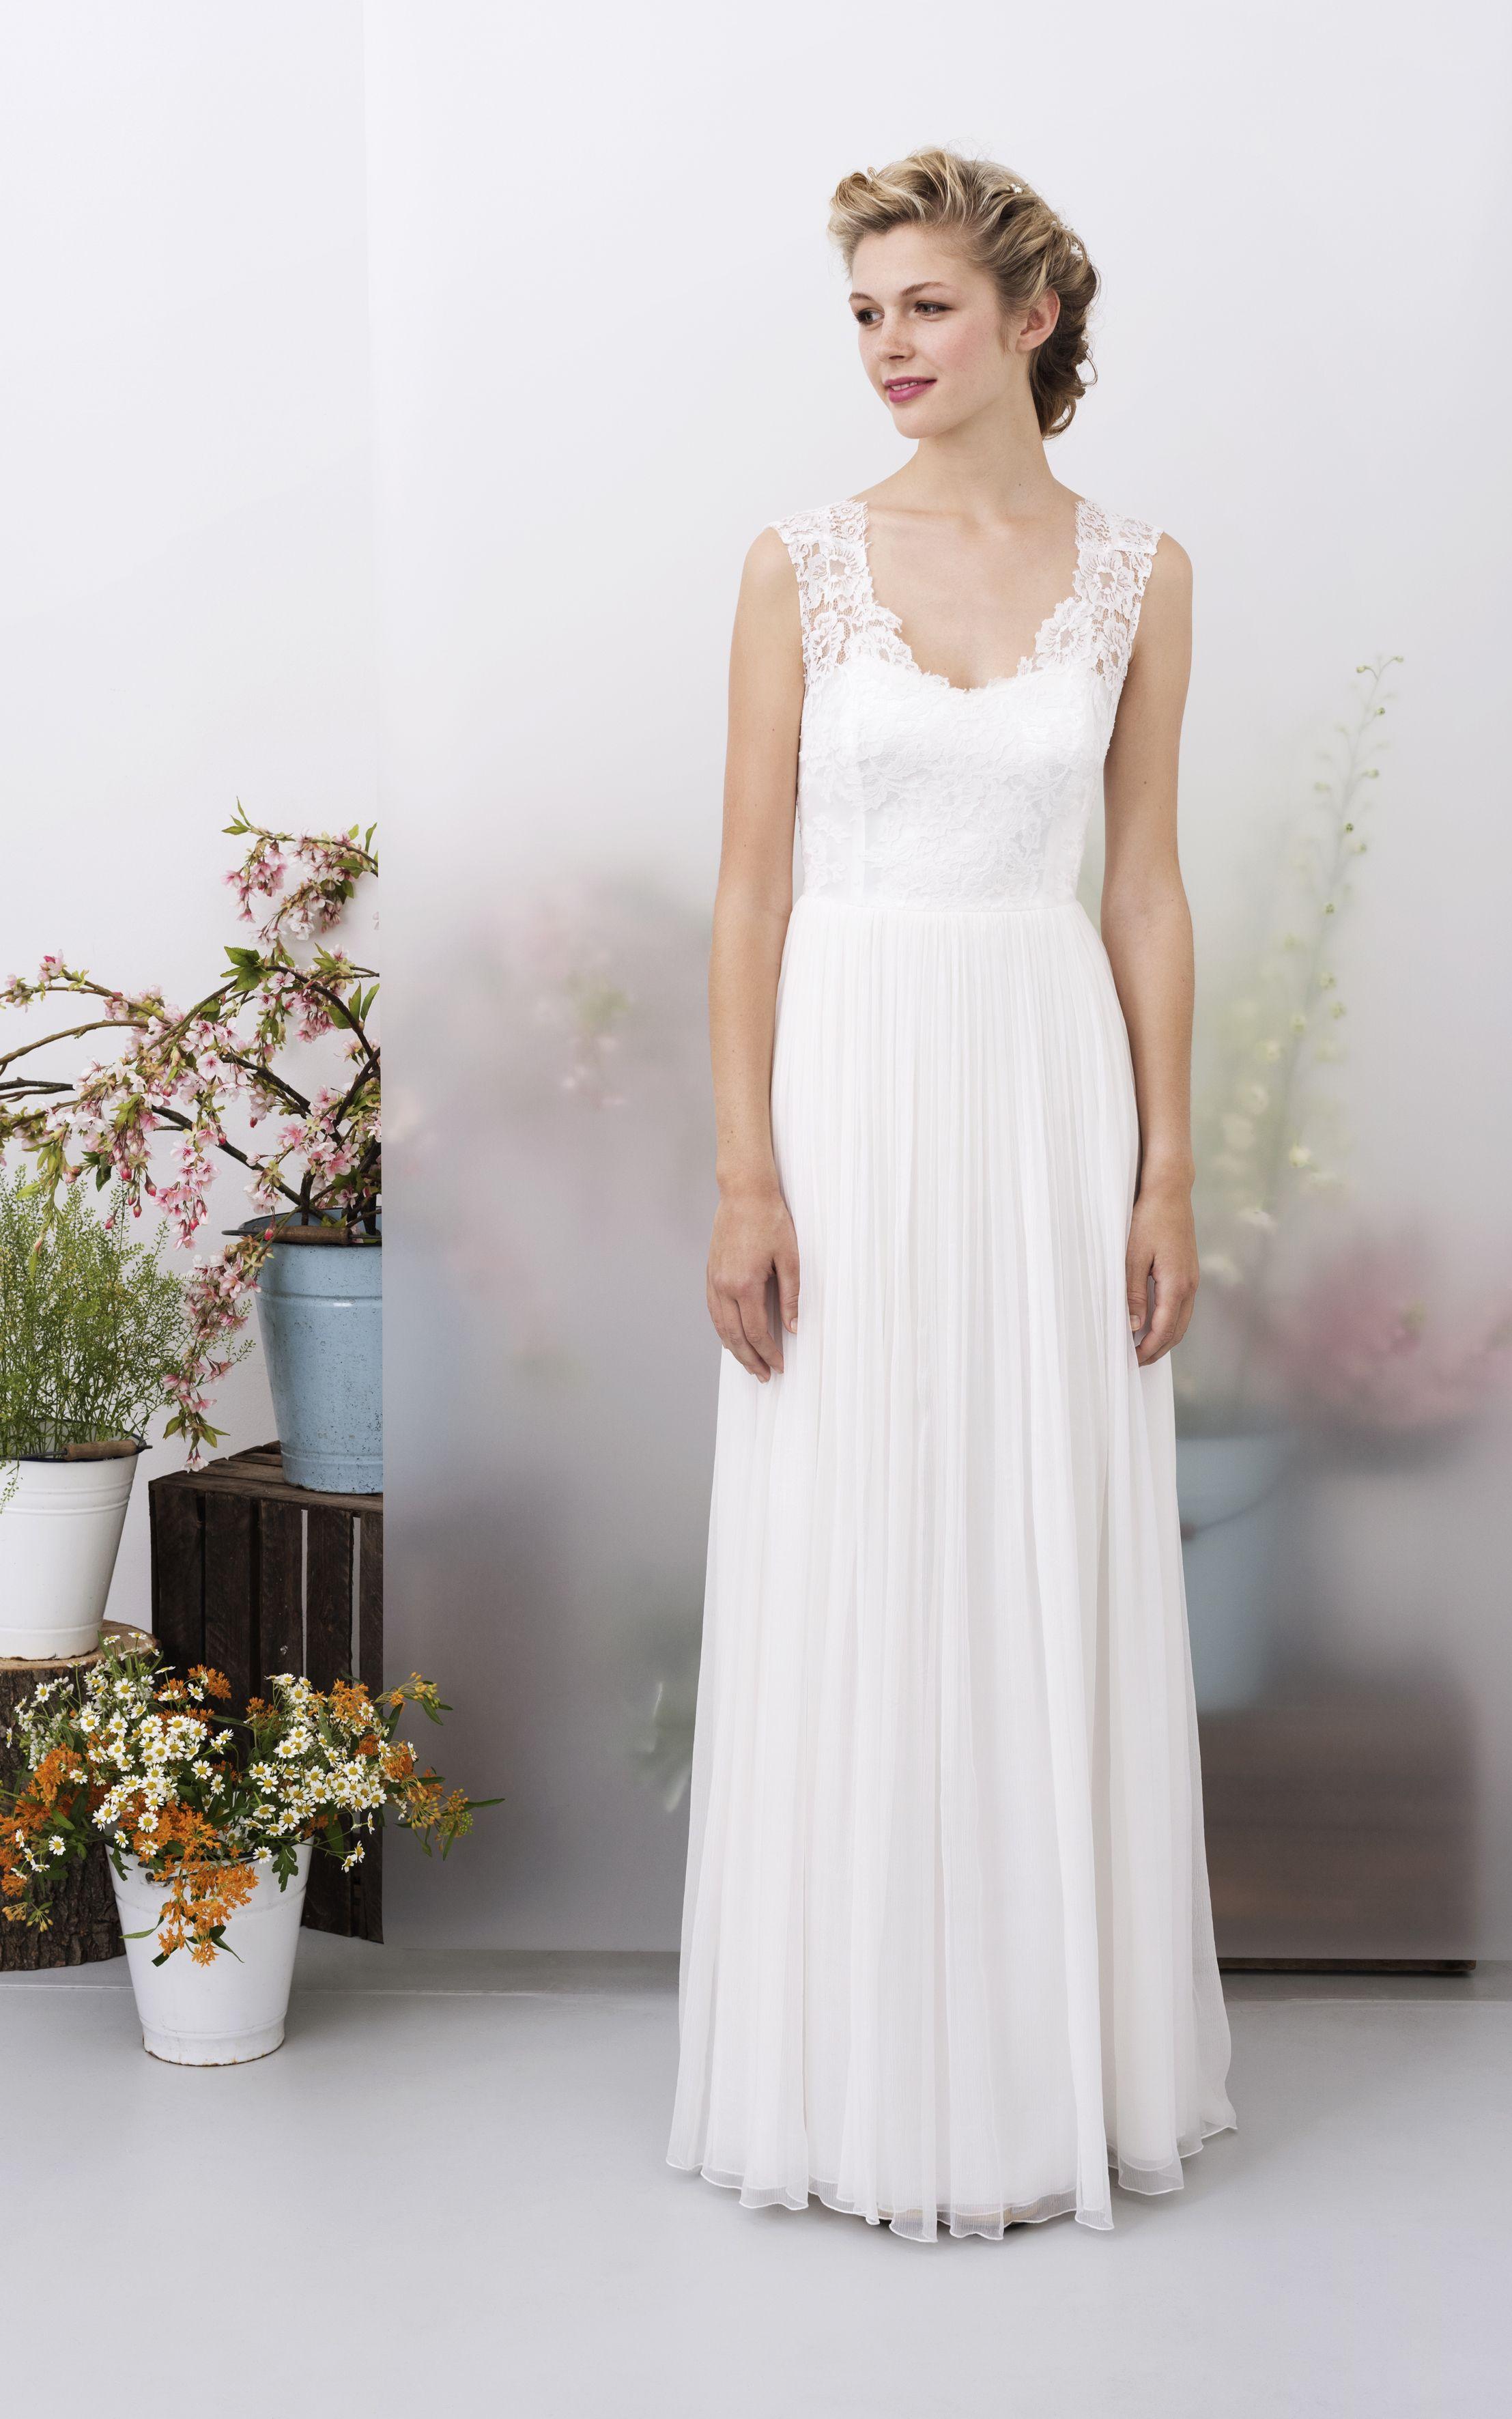 kisui OUI Collection Bridal Style: meja, Brautkleid, Weddingdress by ...